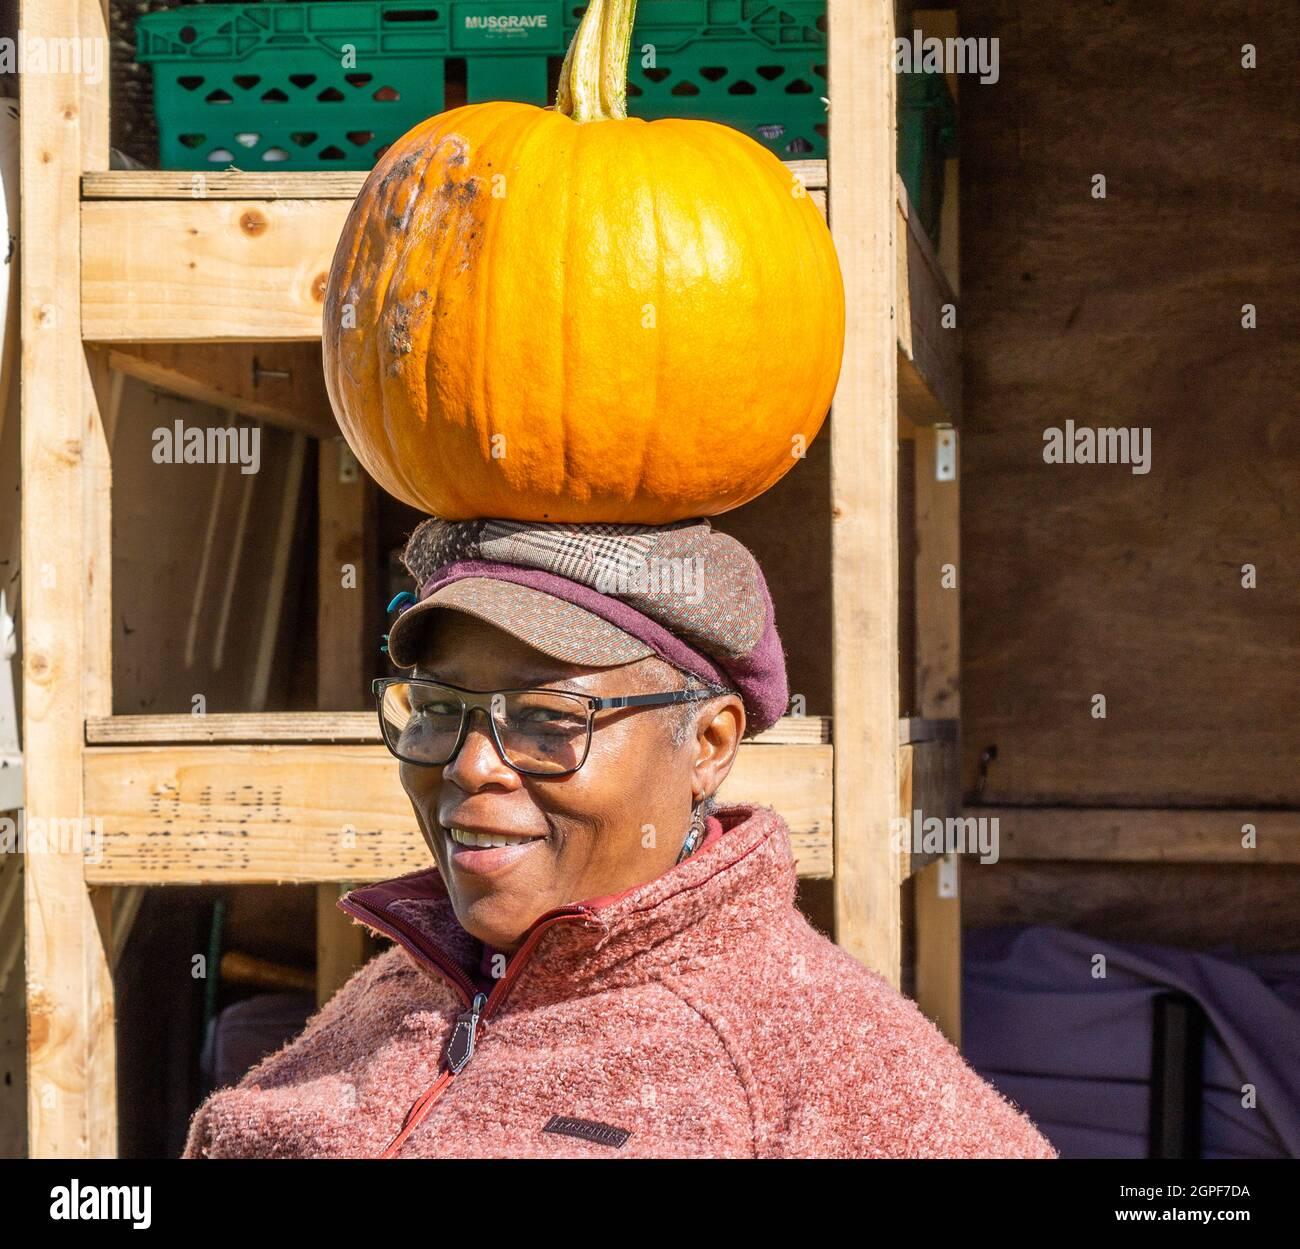 senior-woman-selling-pumpkins-balancing-a-pumpkin-on-her-head-2GPF7DA.jpg